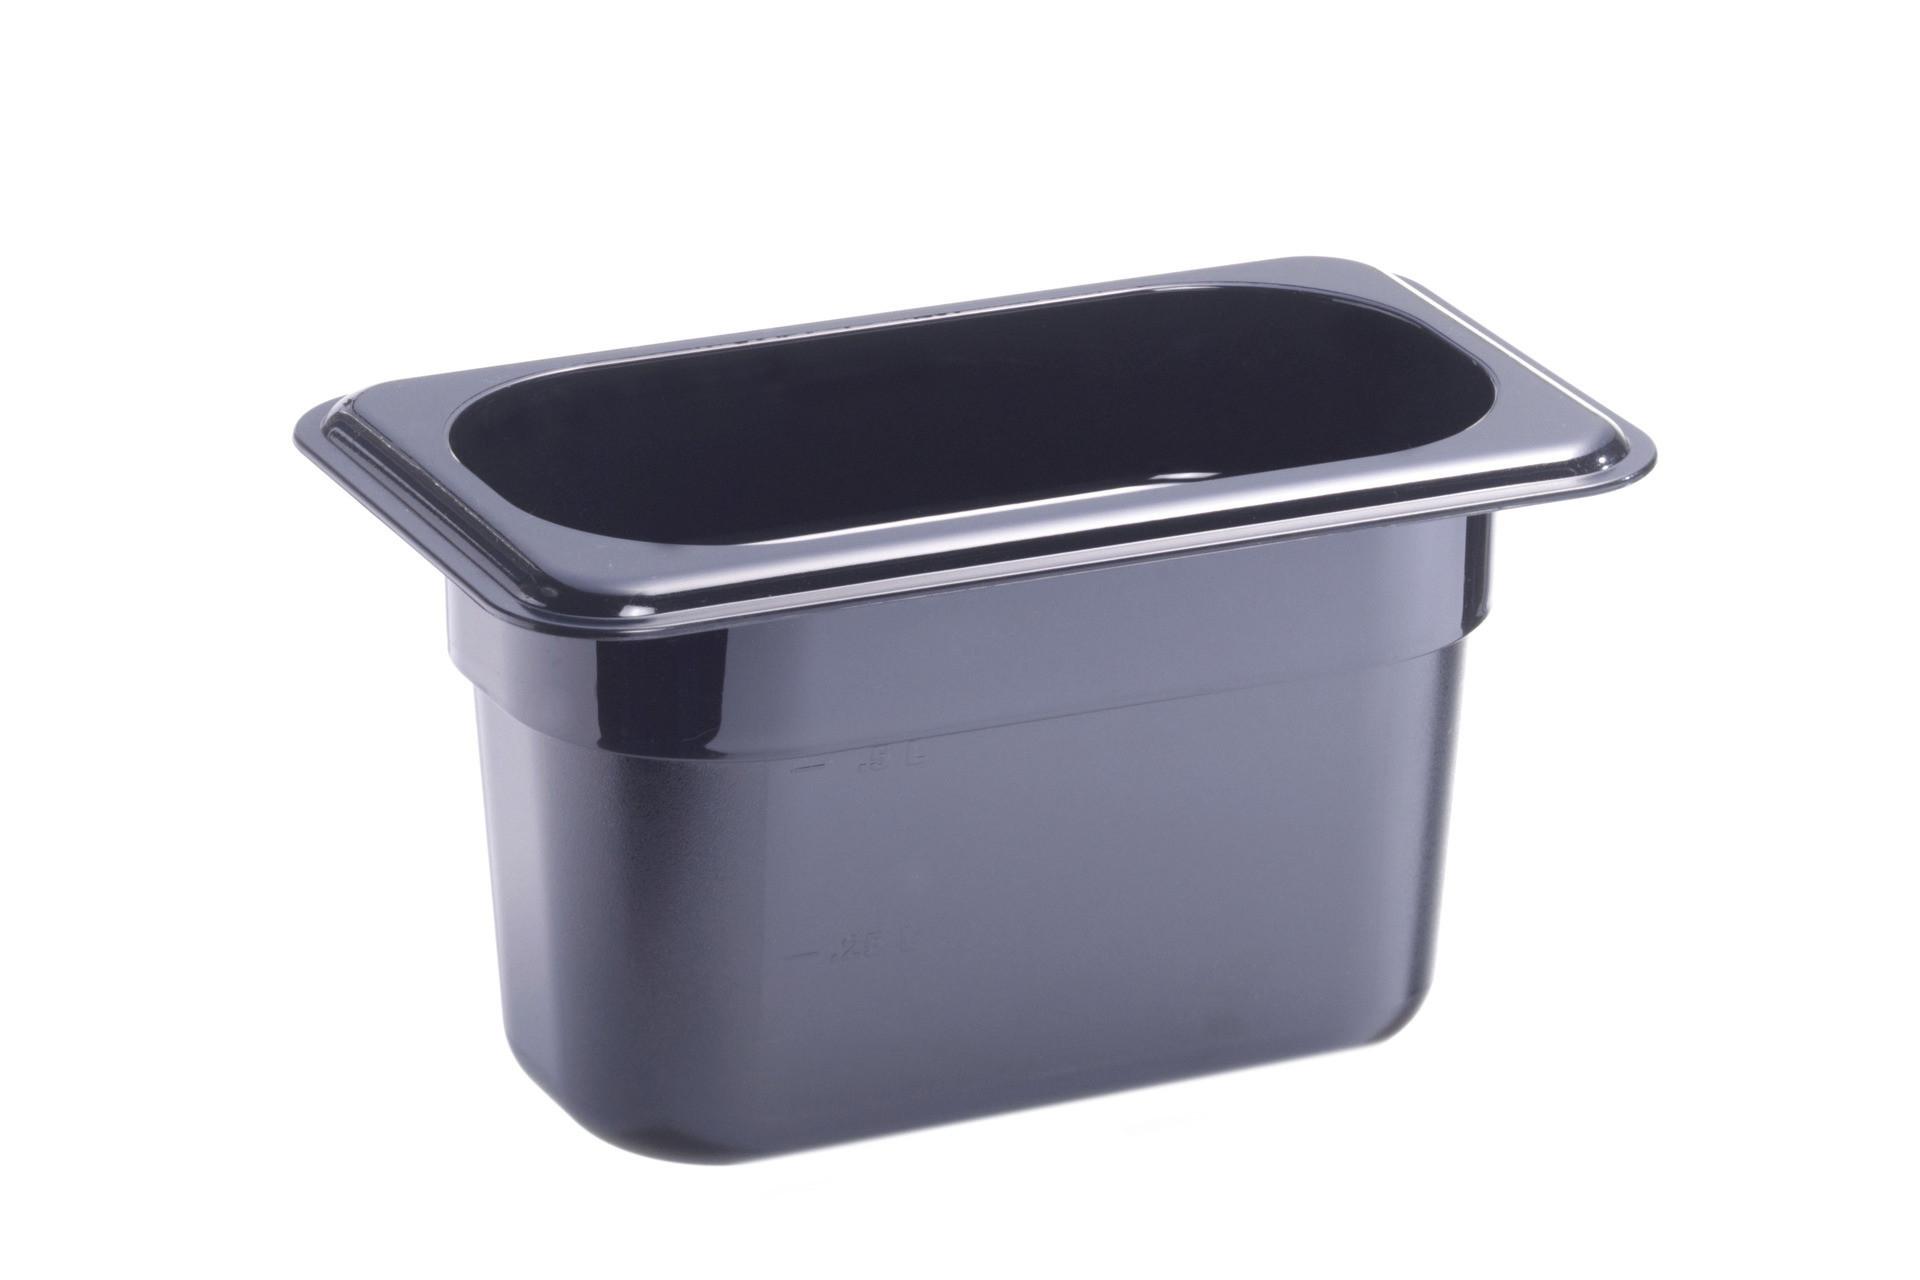 GN-Behälter, GN 1/9, 176 x 108 x 100 mm, Polycarbonat, schwarz